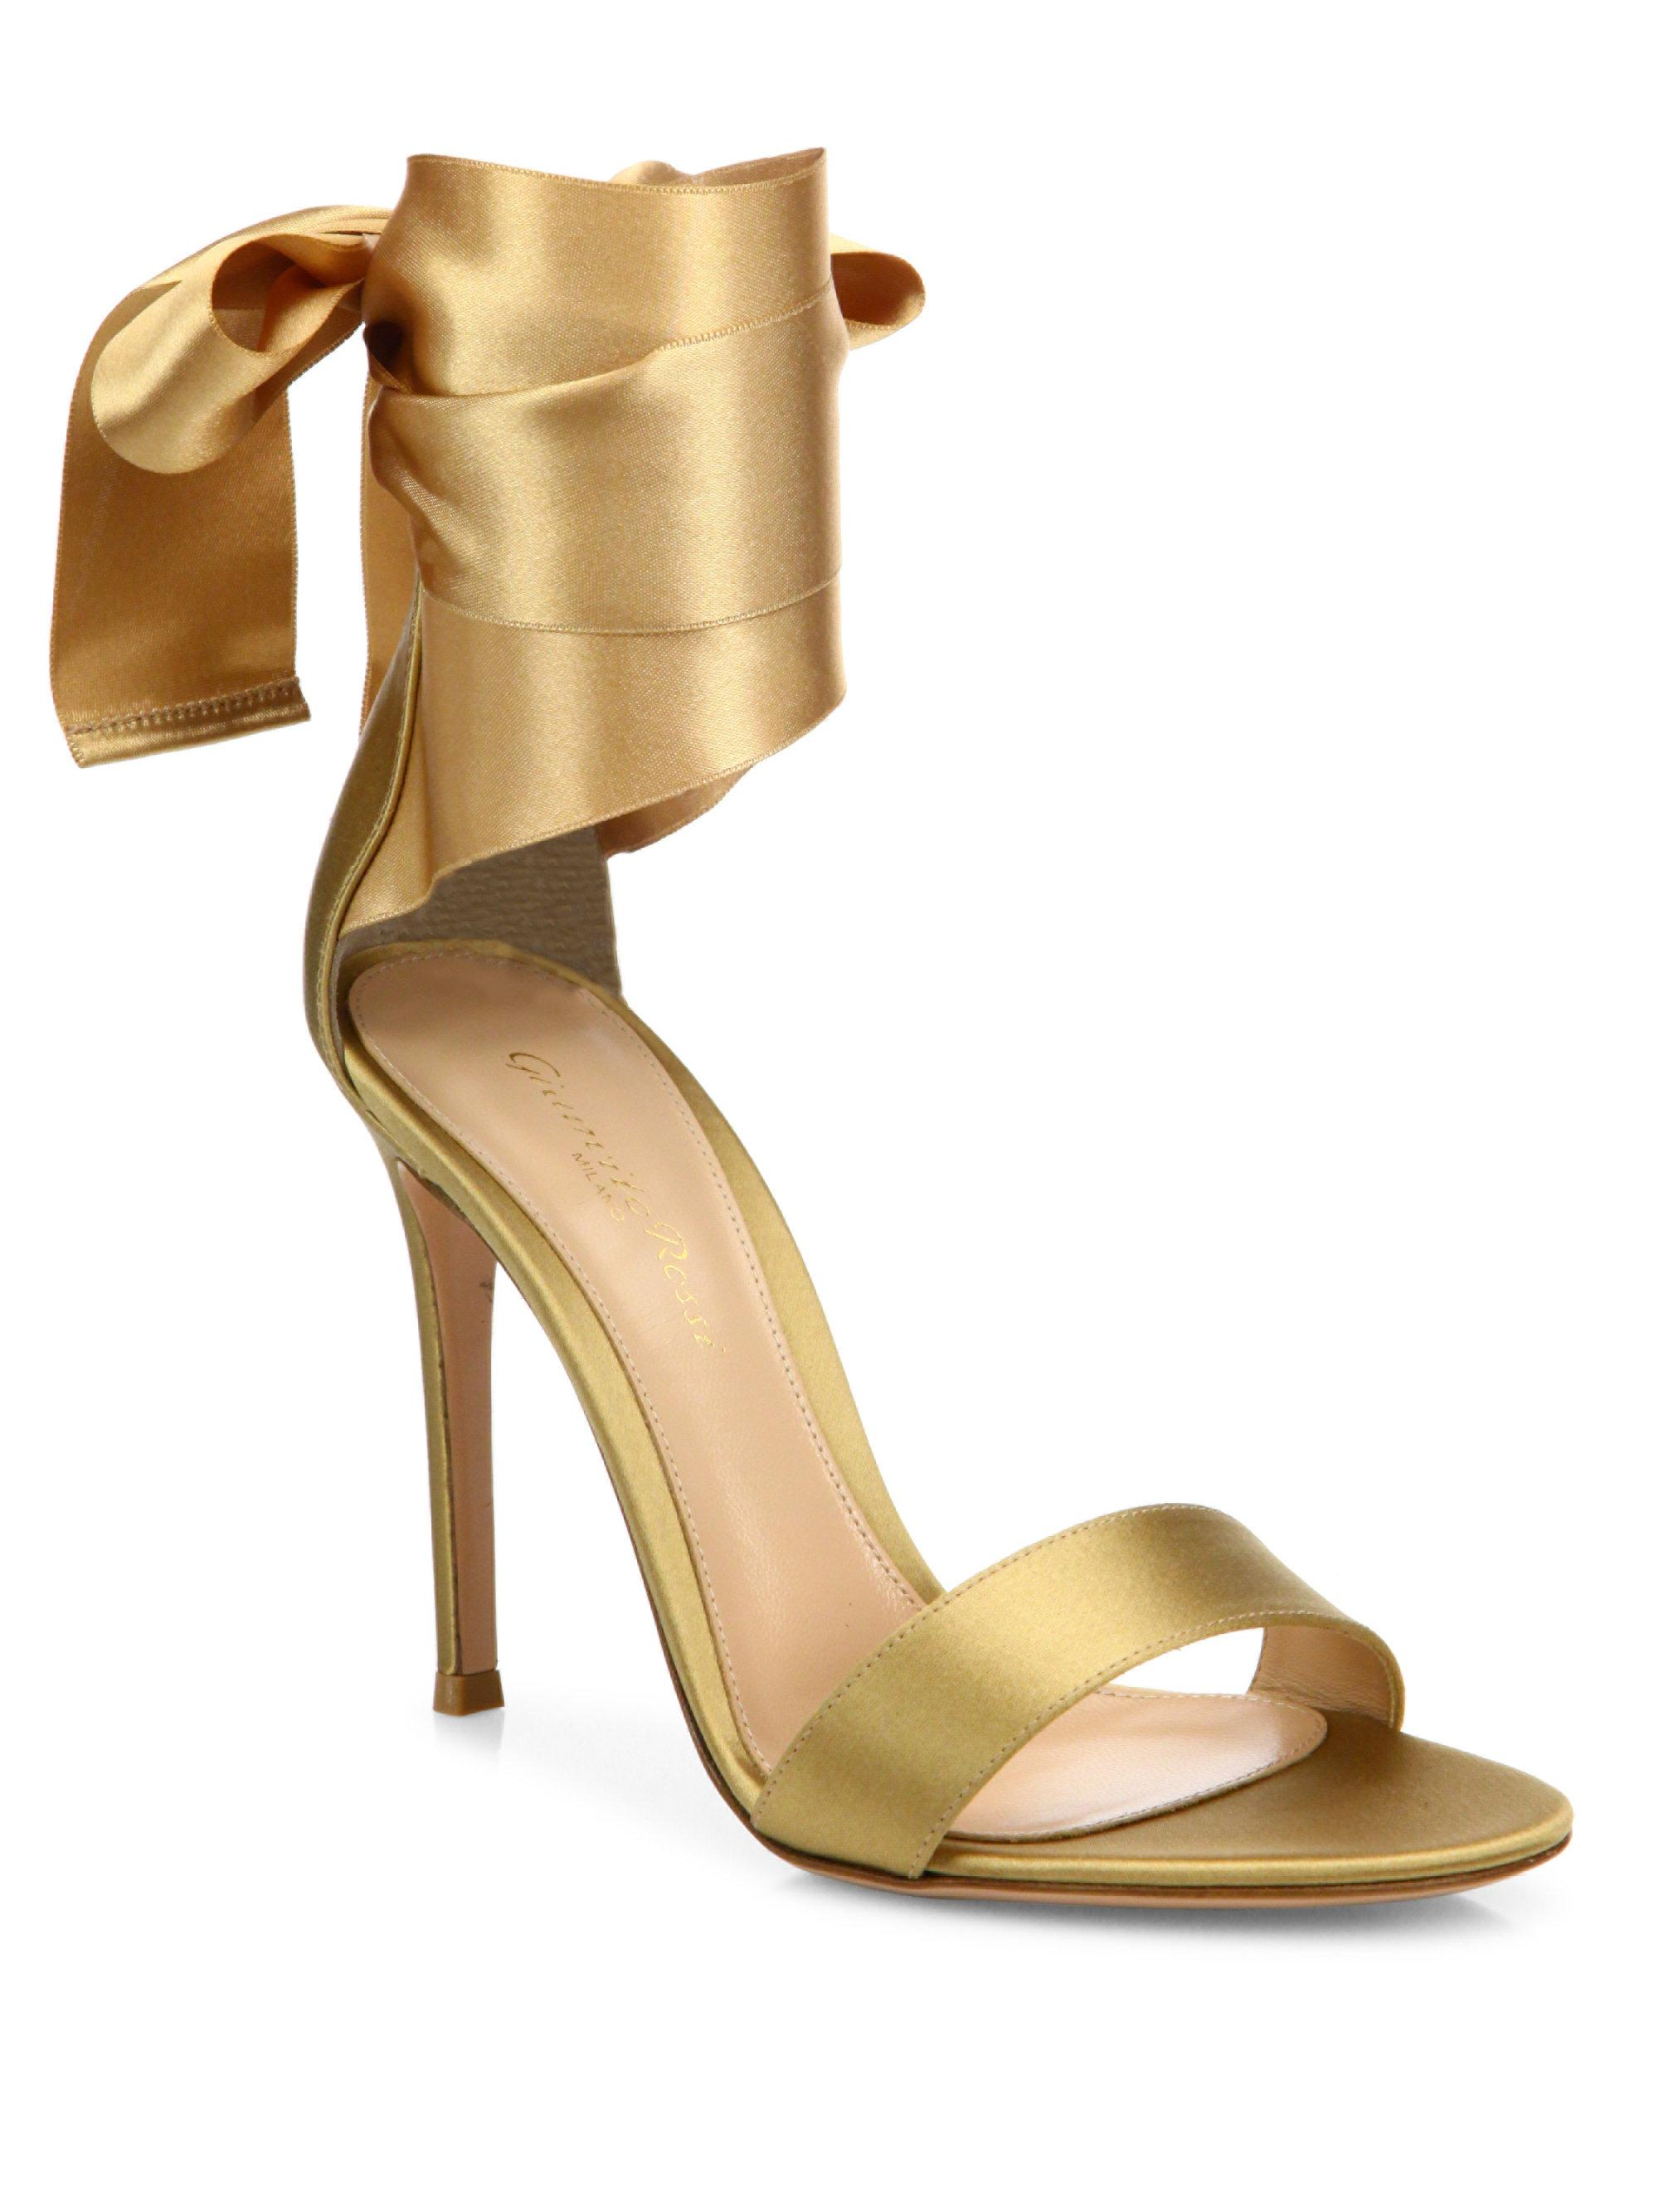 Gala sandals - Metallic Gianvito Rossi gUDu3A